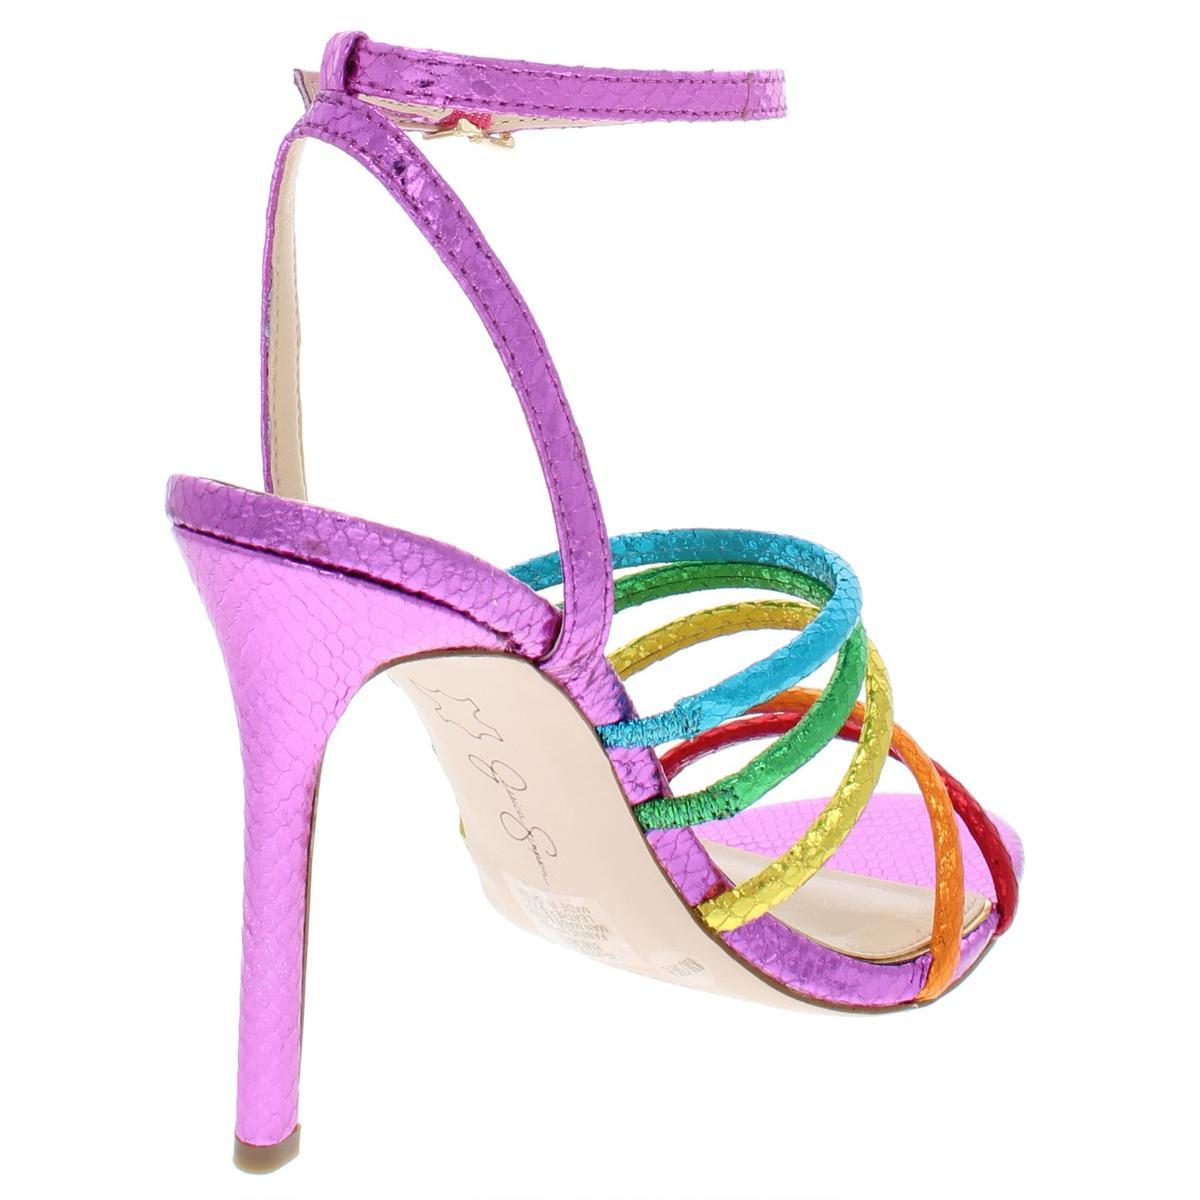 Jessica-Simpson-Femme-Joselle-a-Lanieres-Talon-Haut-Robe-Sandales-Chaussures-BHFO-7879 miniature 8